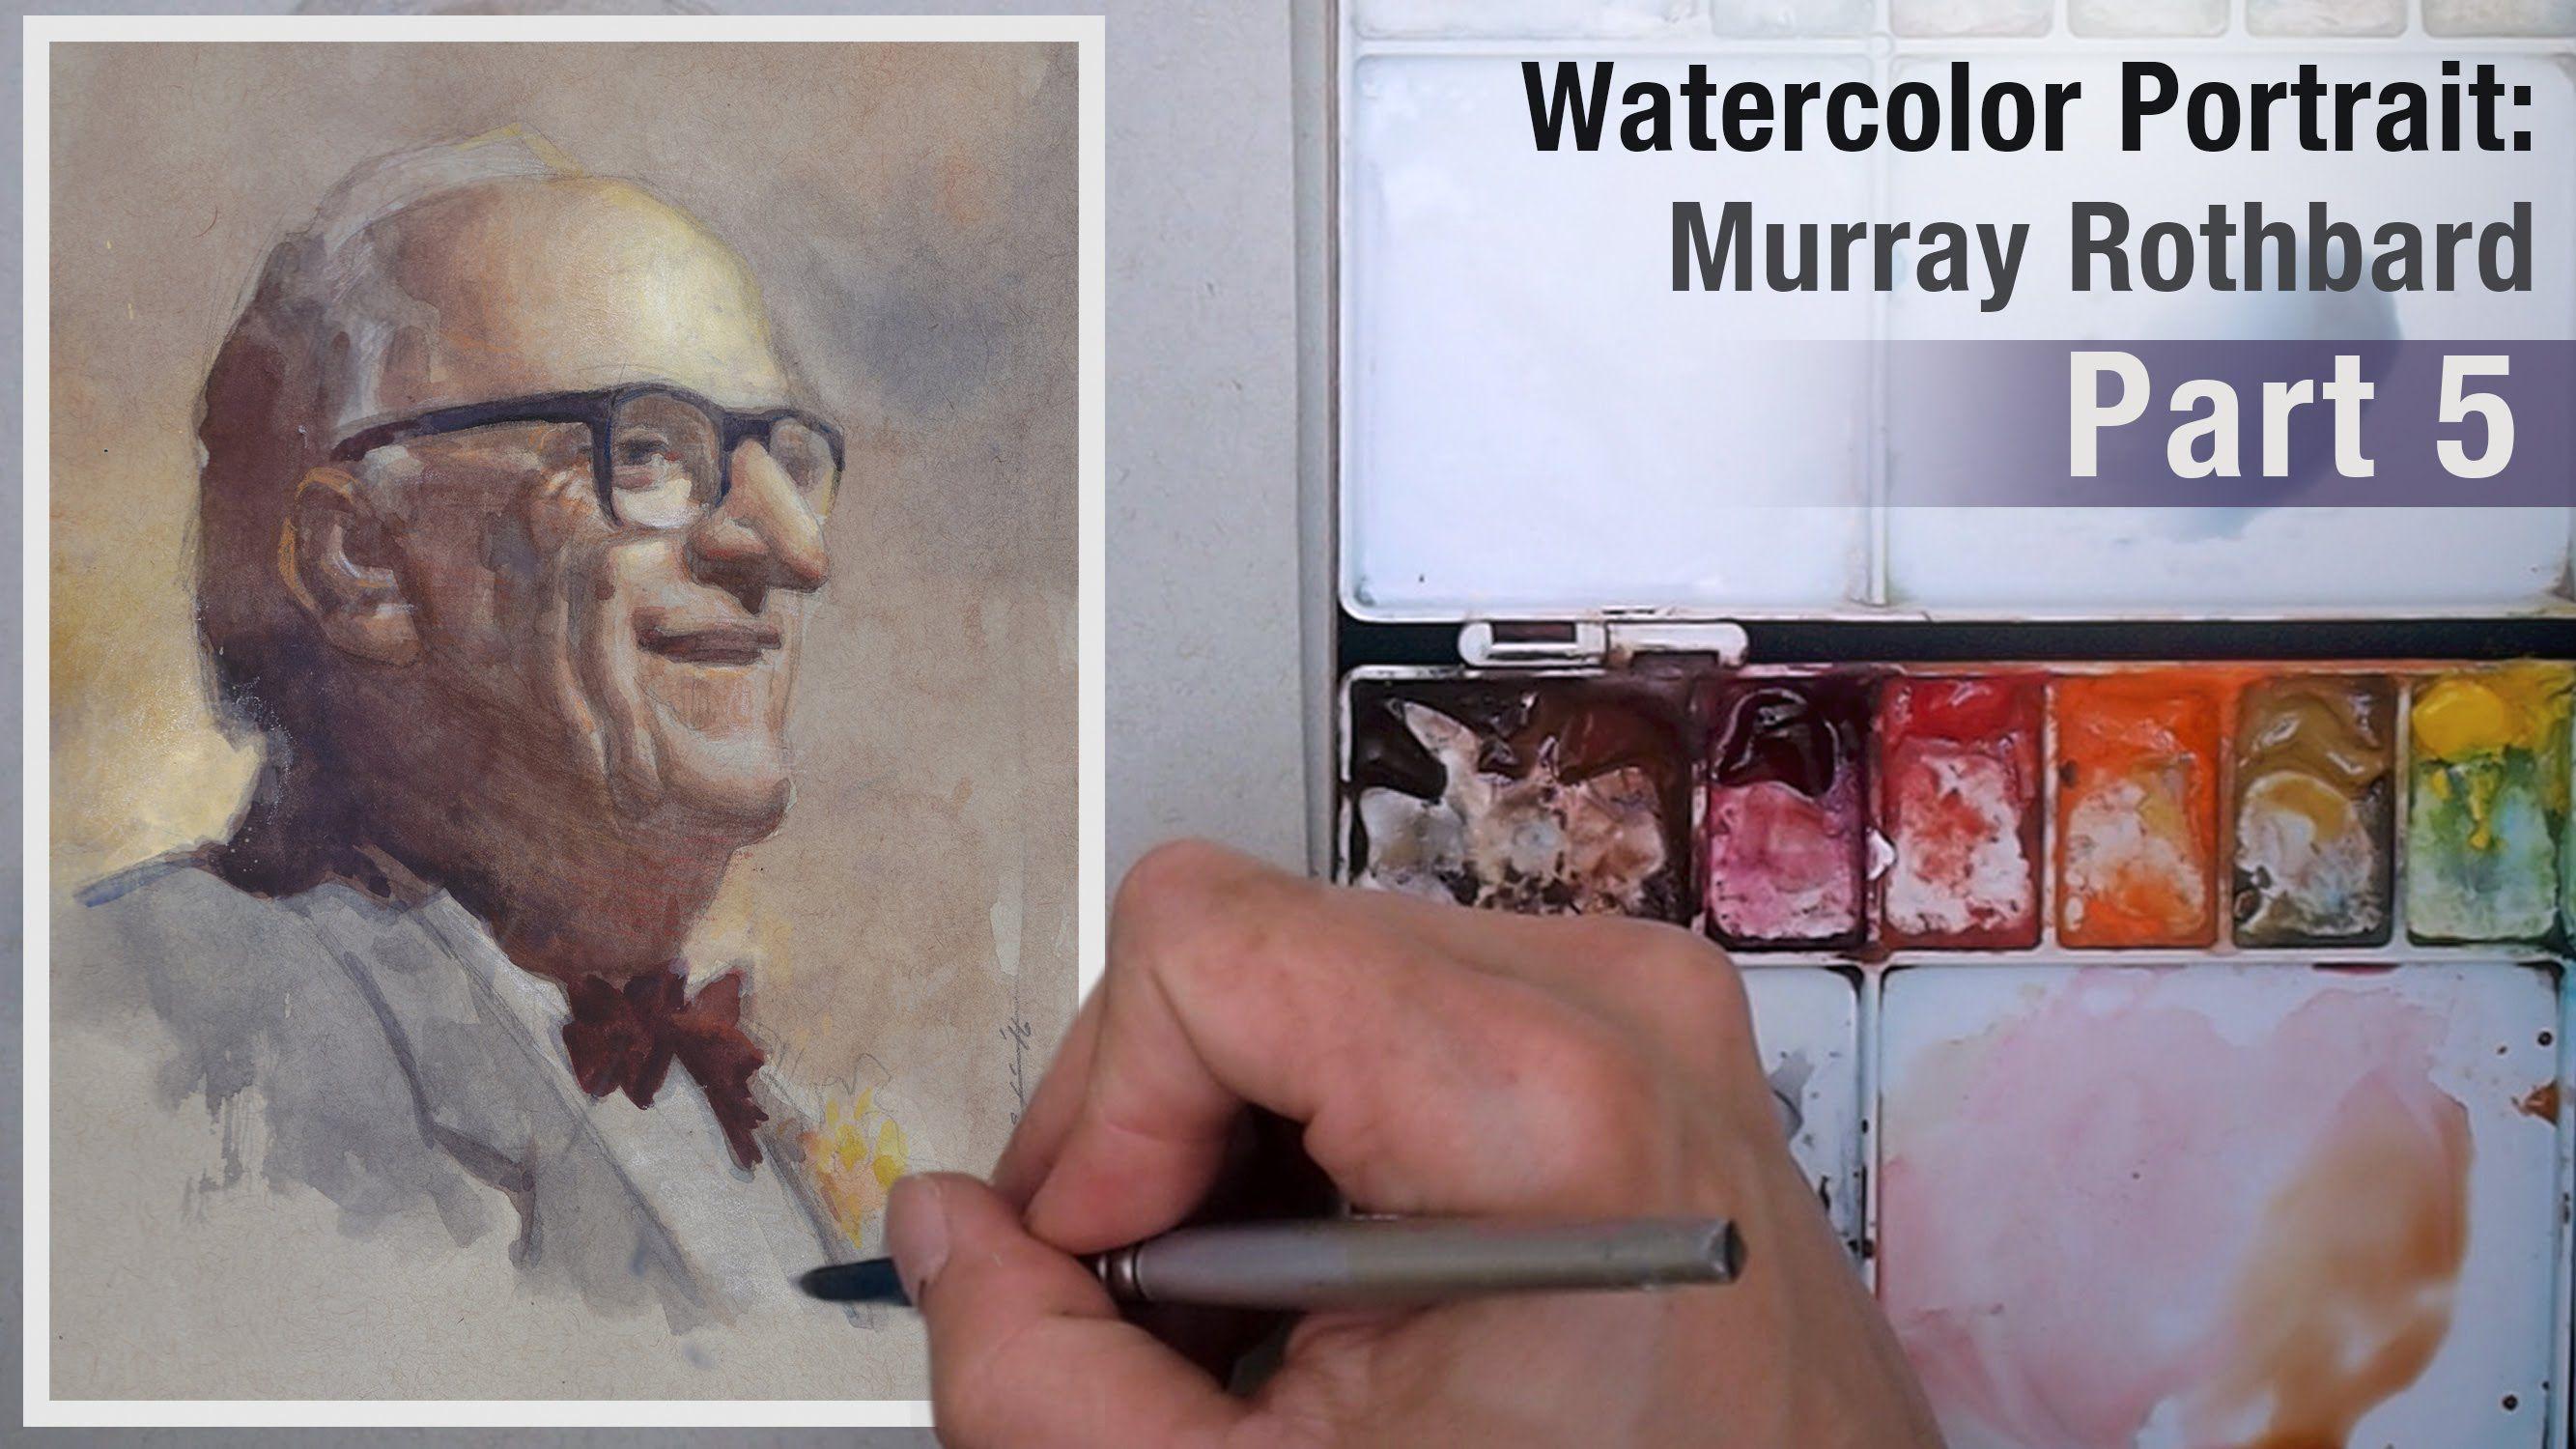 Watercolor Portrait: Murray Rothbard Part 5 | Anatomy | Pinterest ...